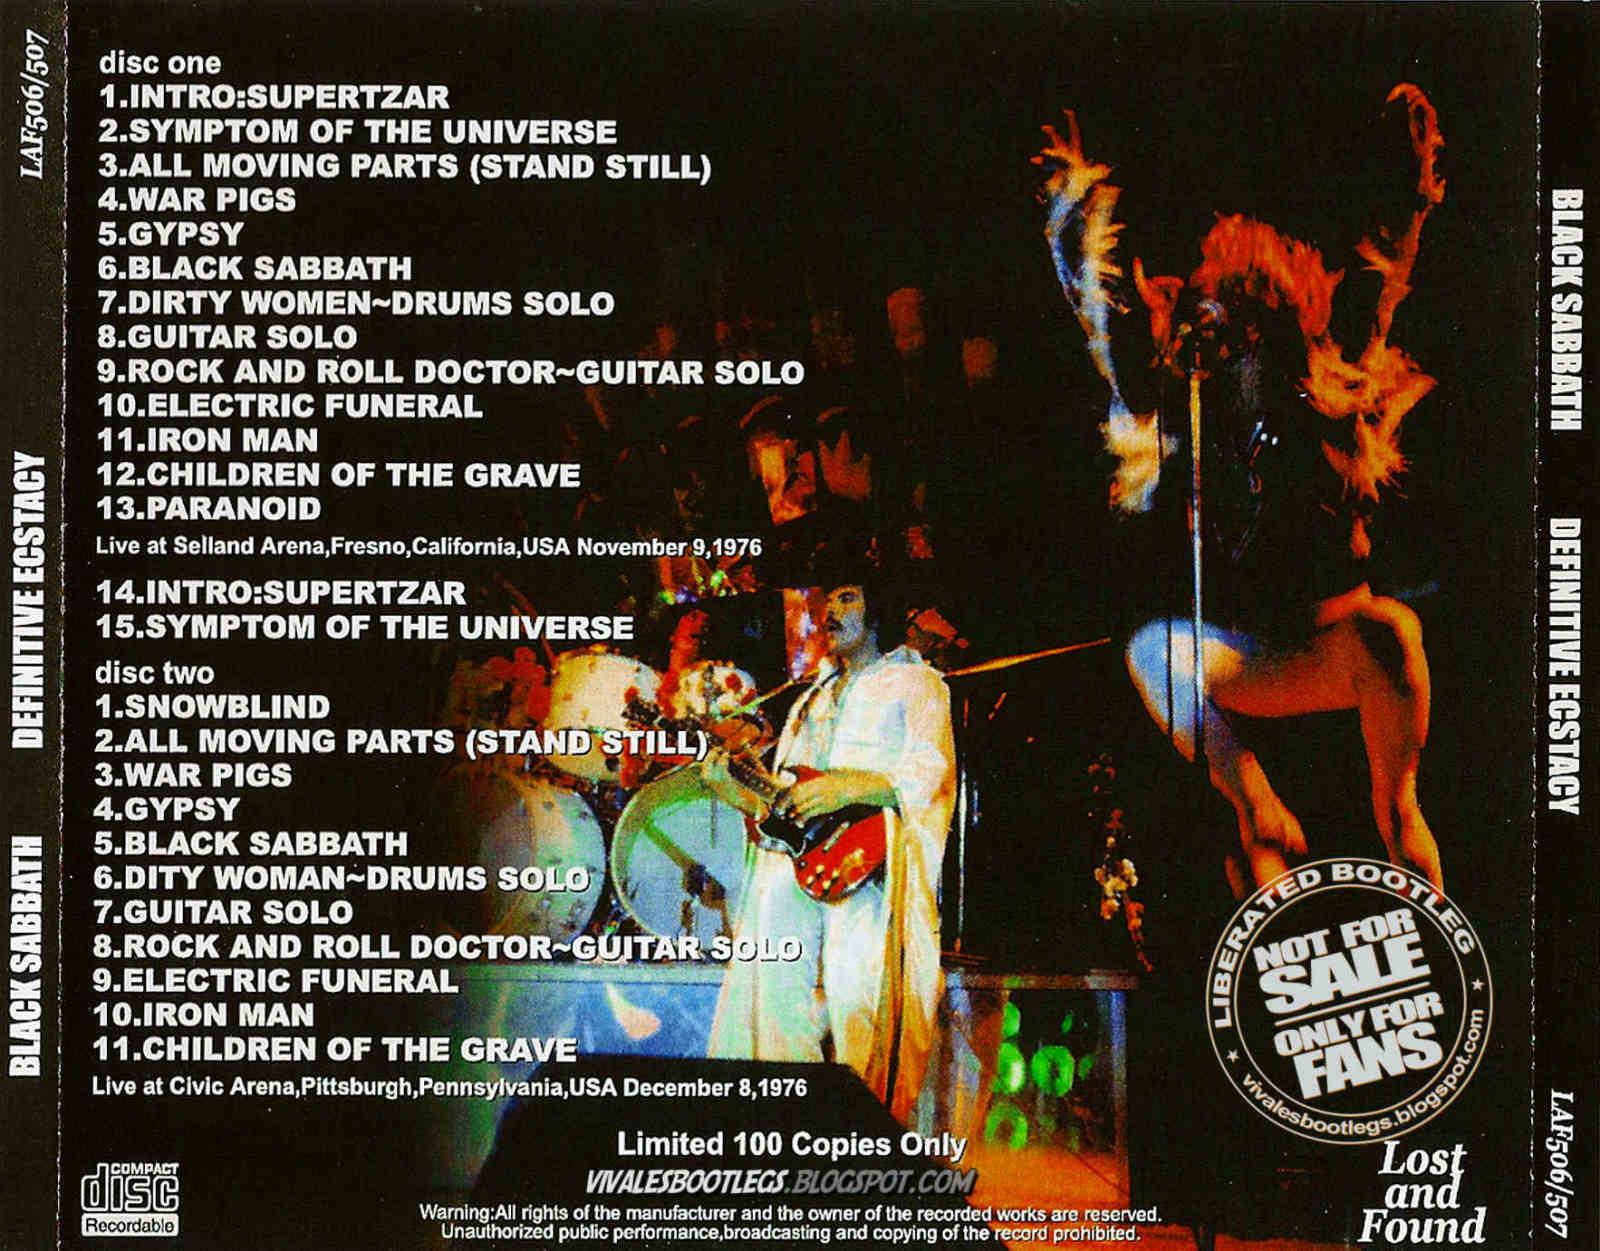 Black Sabbath Definitive Ecstacy Selland Arena Fresno